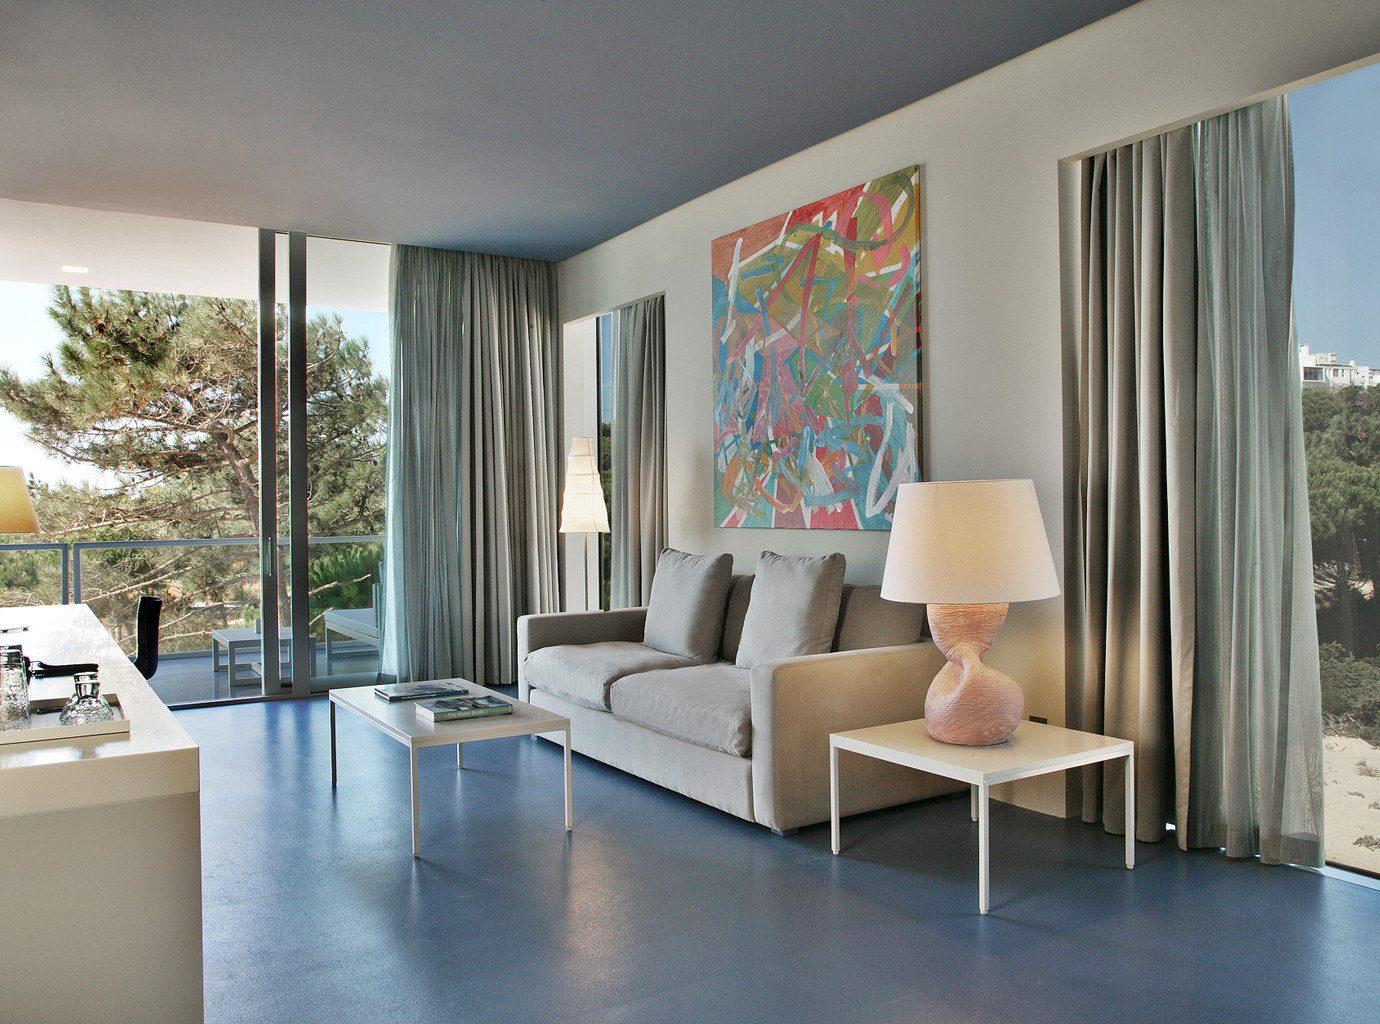 Balcony Modern Resort Scenic views property house living room home condominium Villa nice professional Bedroom flat